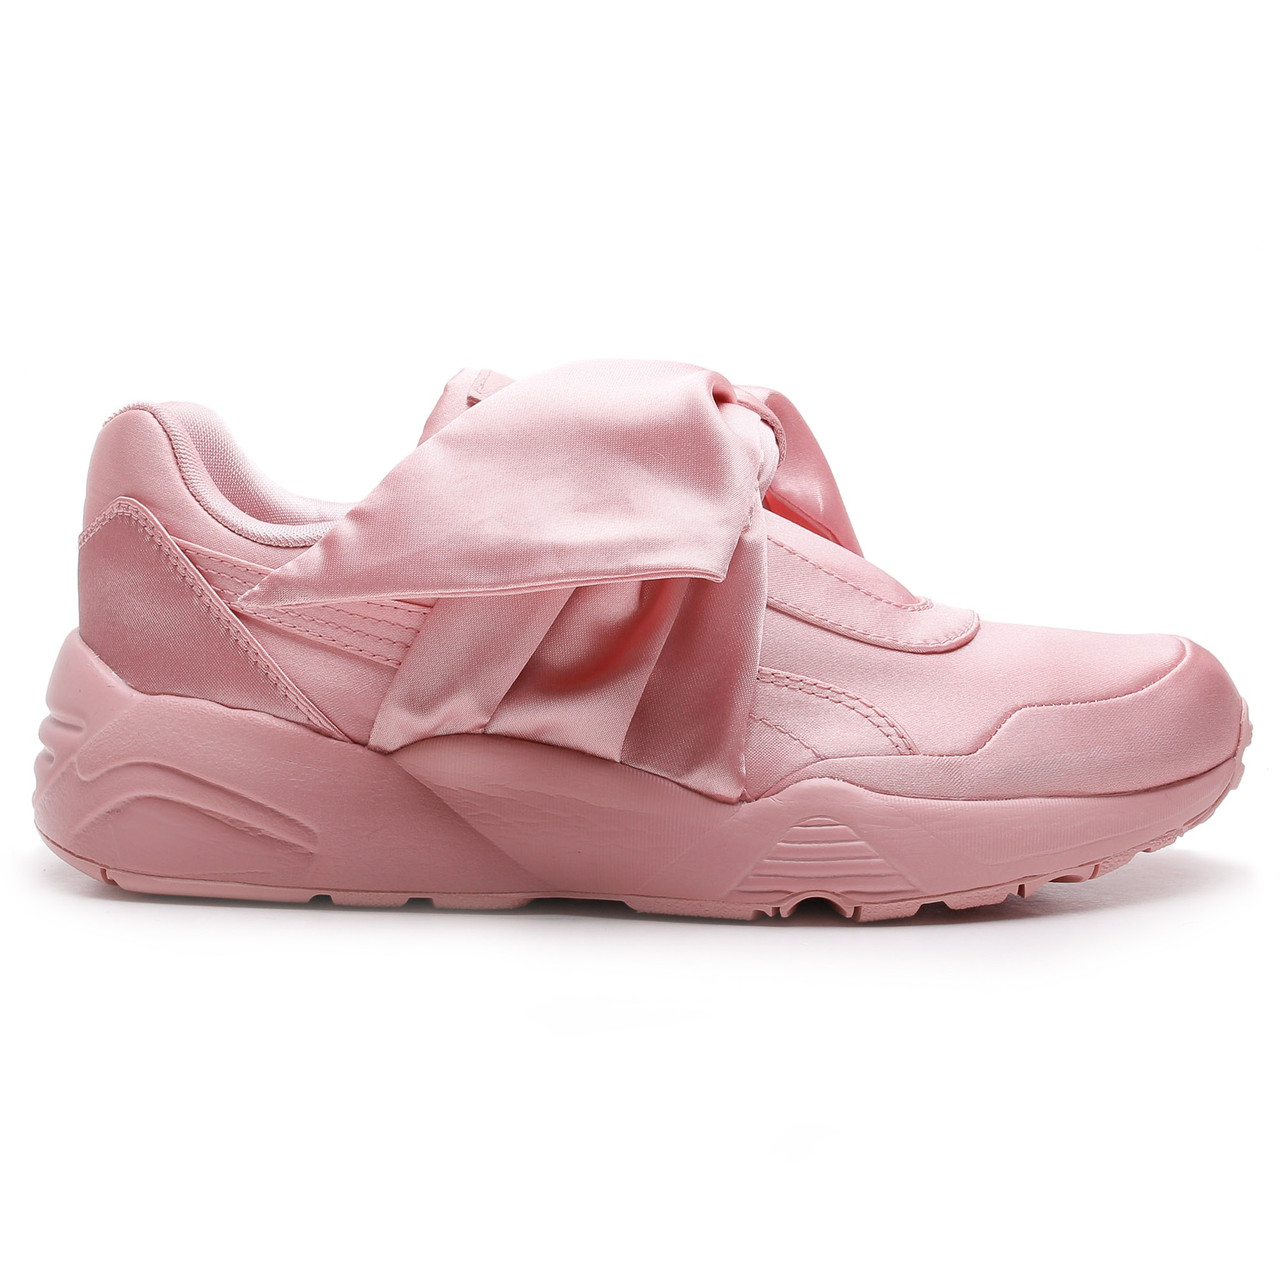 buy popular 0ce55 e716a КРОССОВКИ Puma FENTY by Rihanna Bow Sneaker